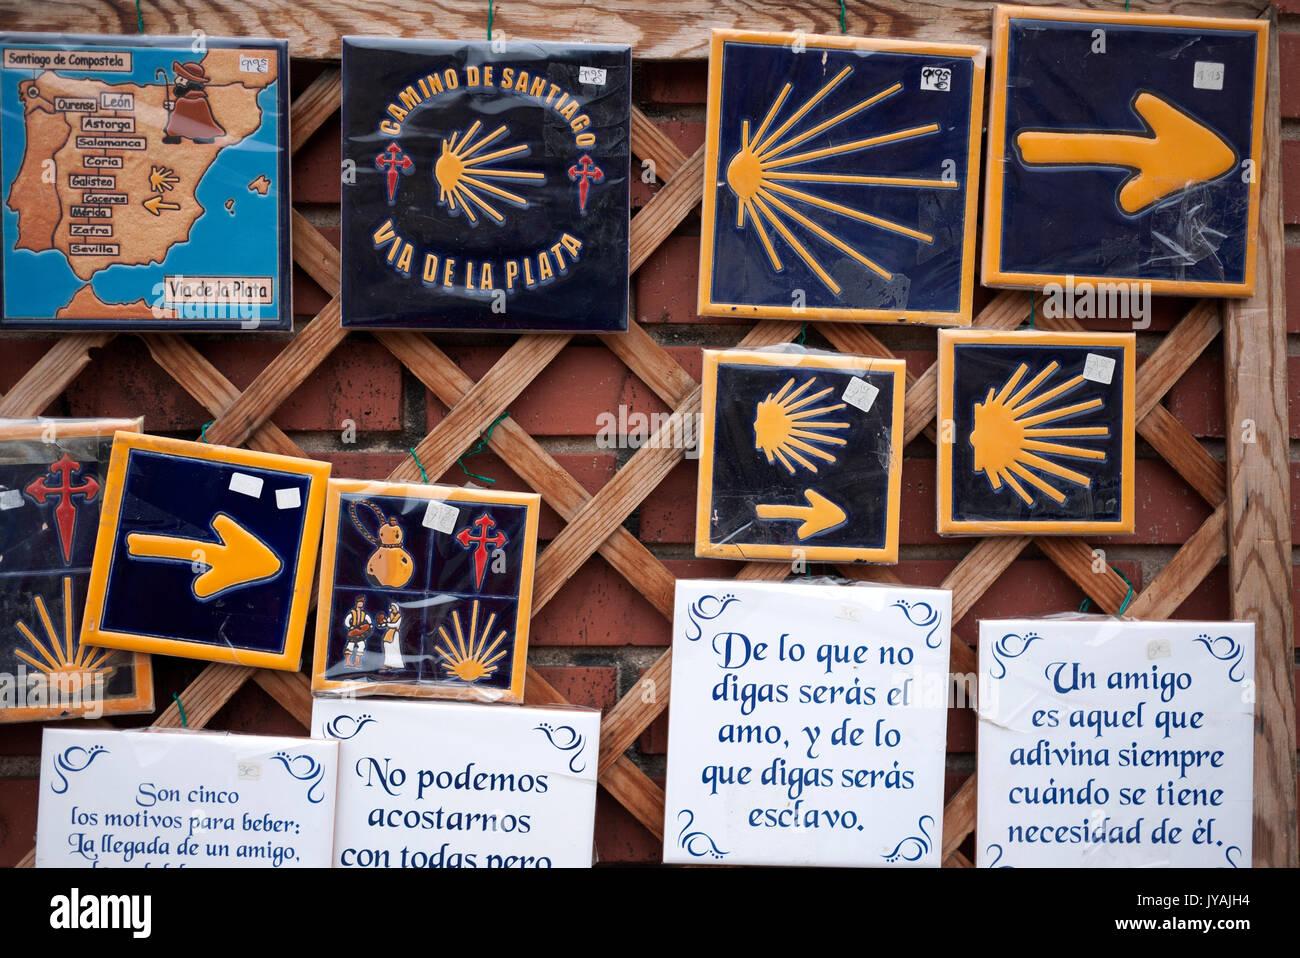 Camino de santiago via de la plata souvenir di piastrelle in